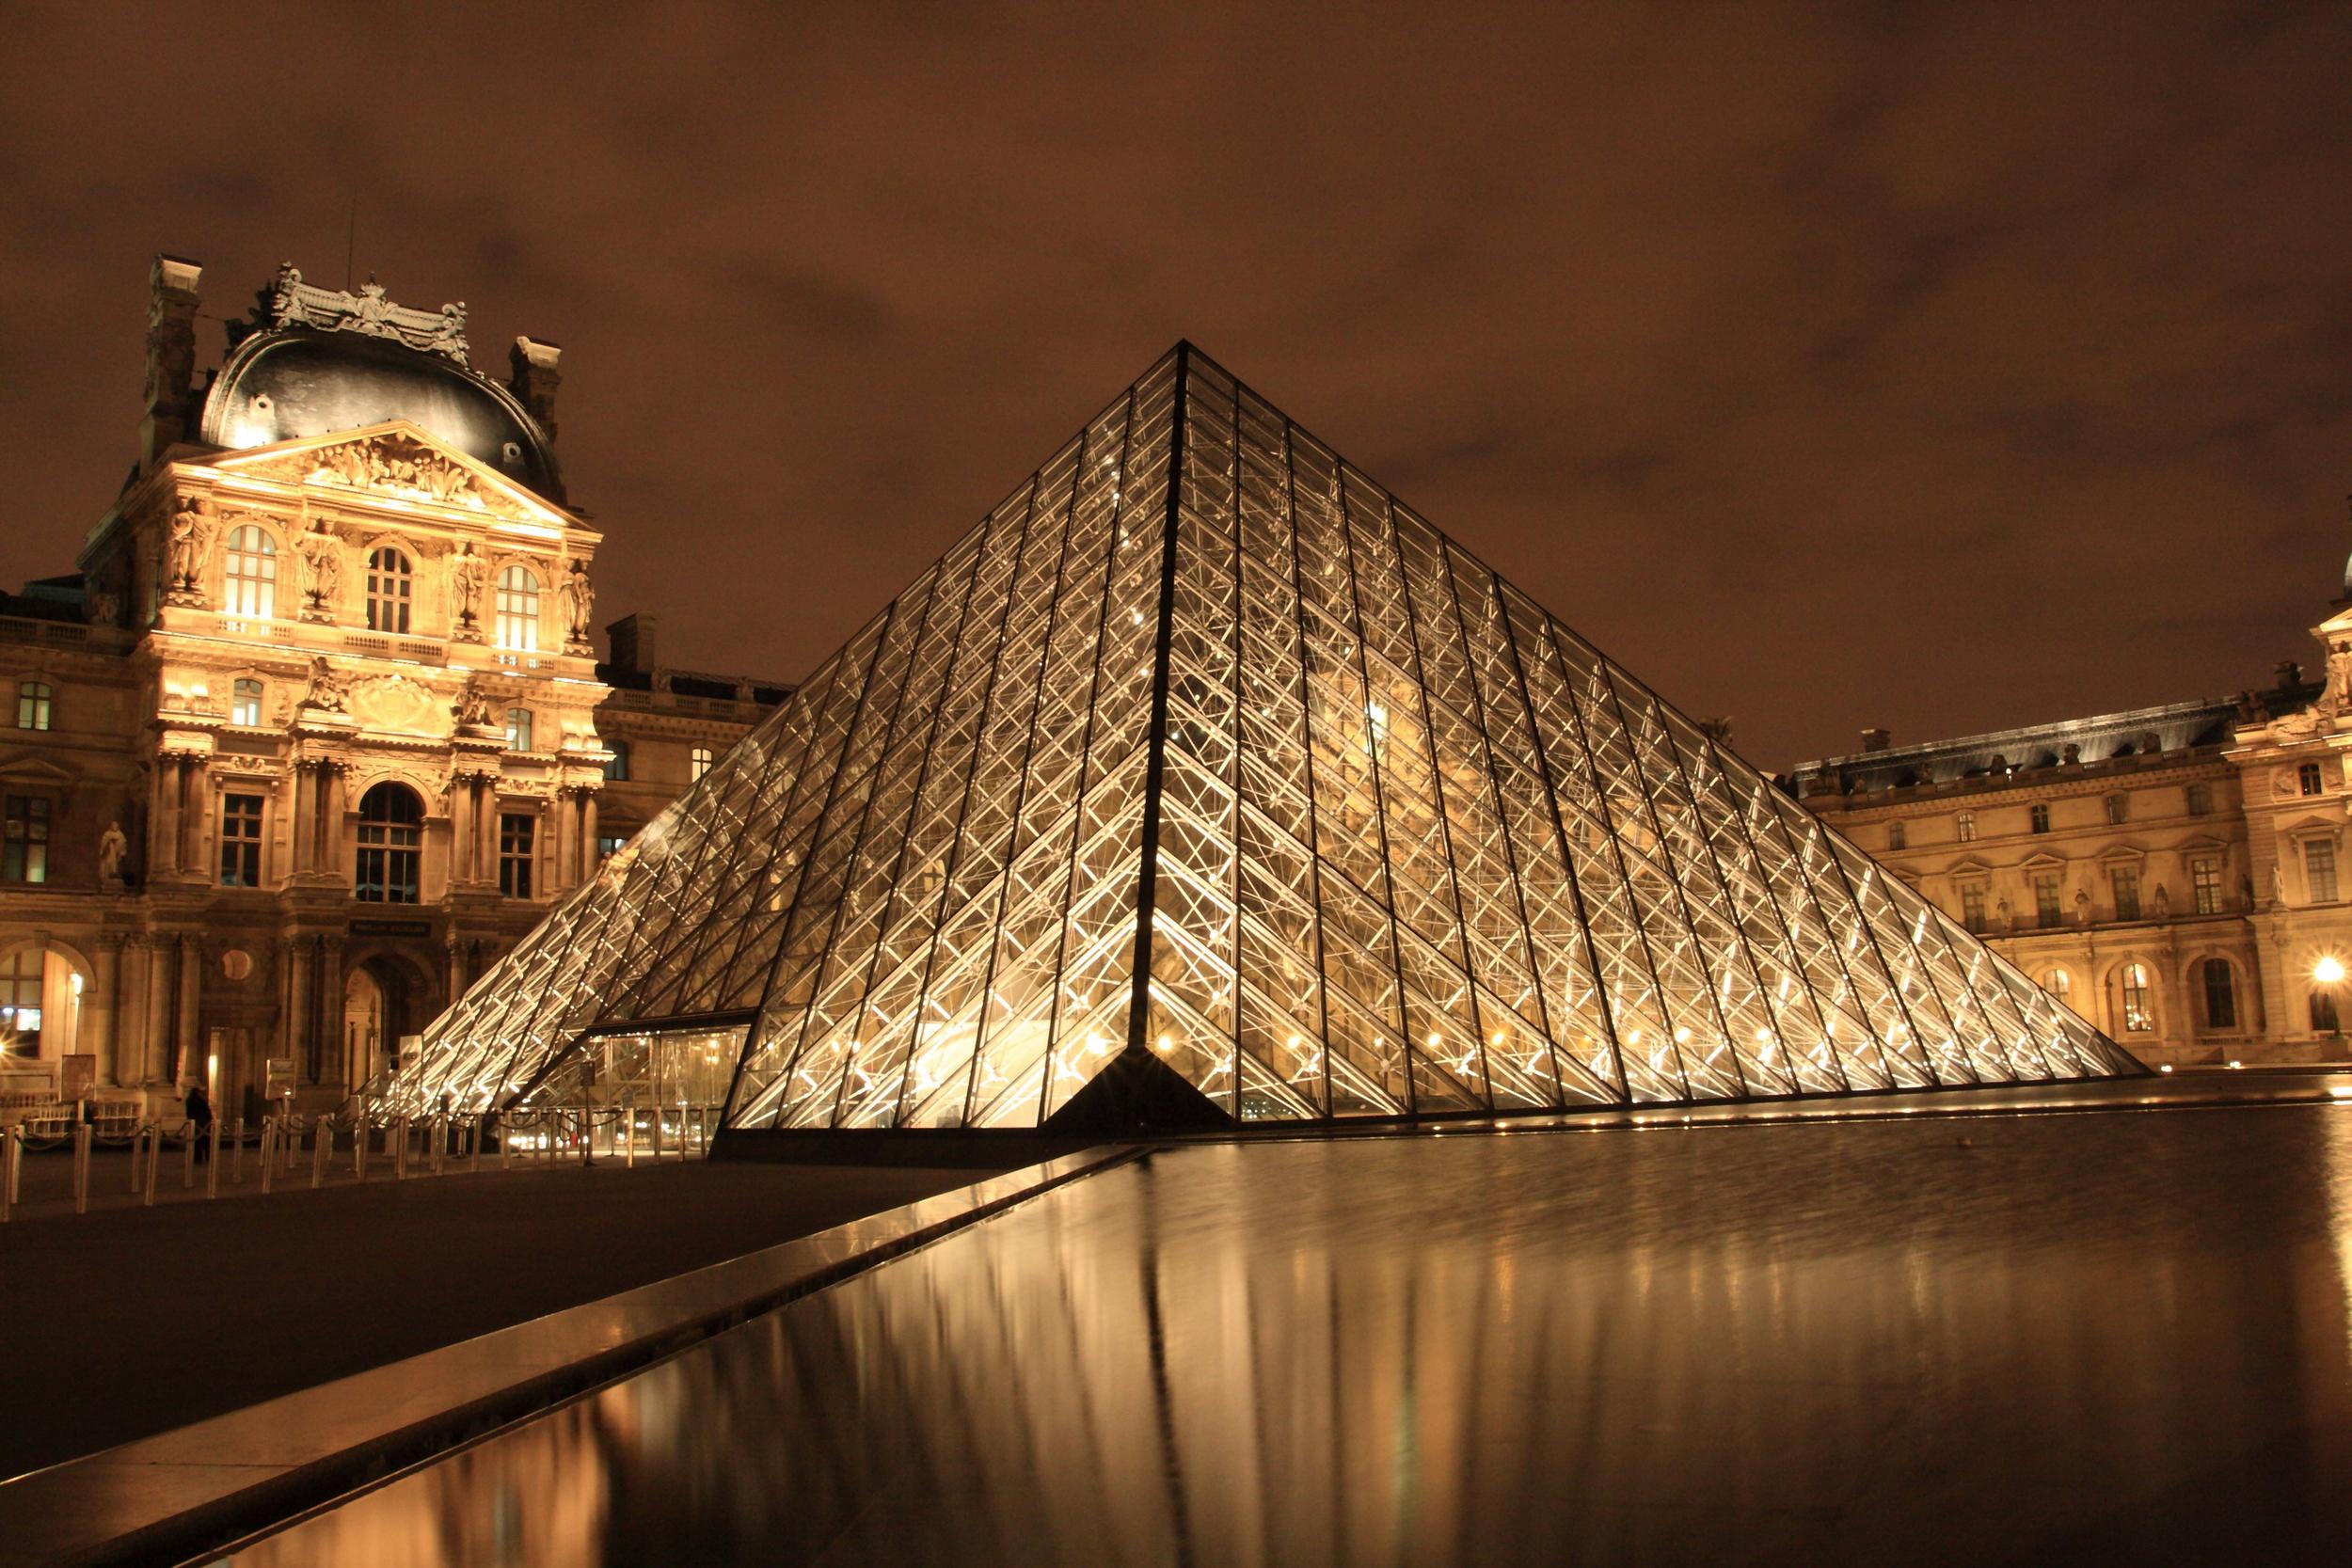 Paris - Louvre at night.jpg